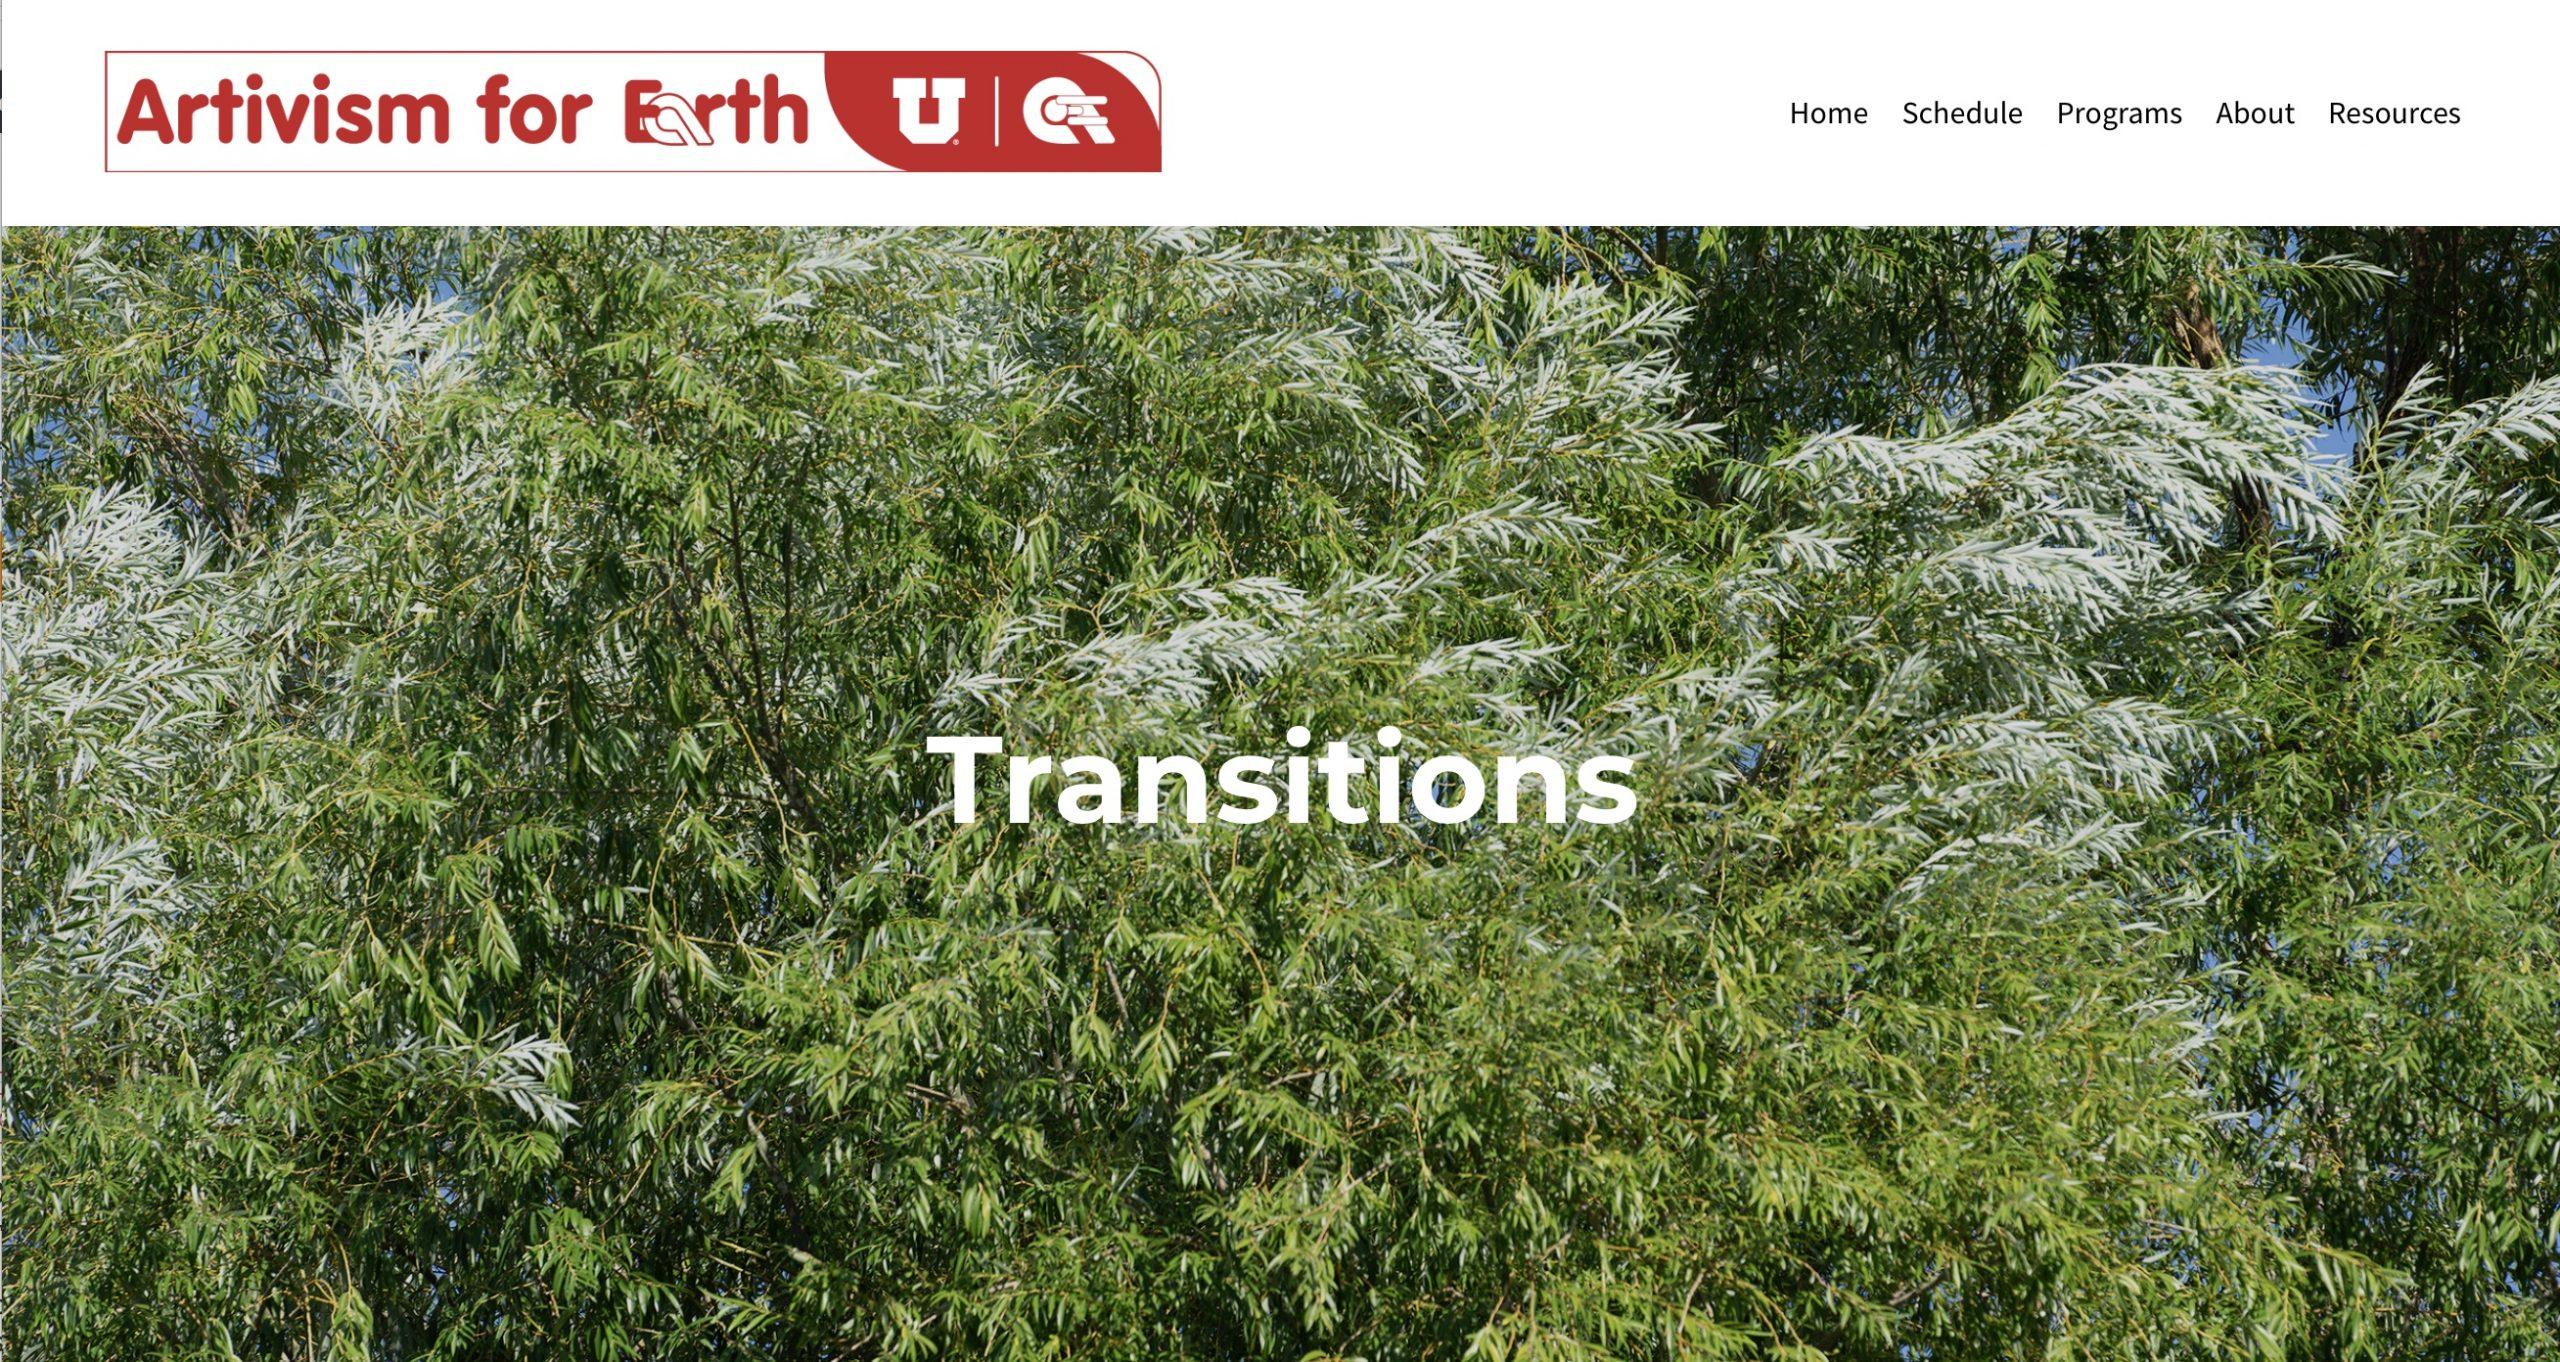 Artivism4Earth-Transitions